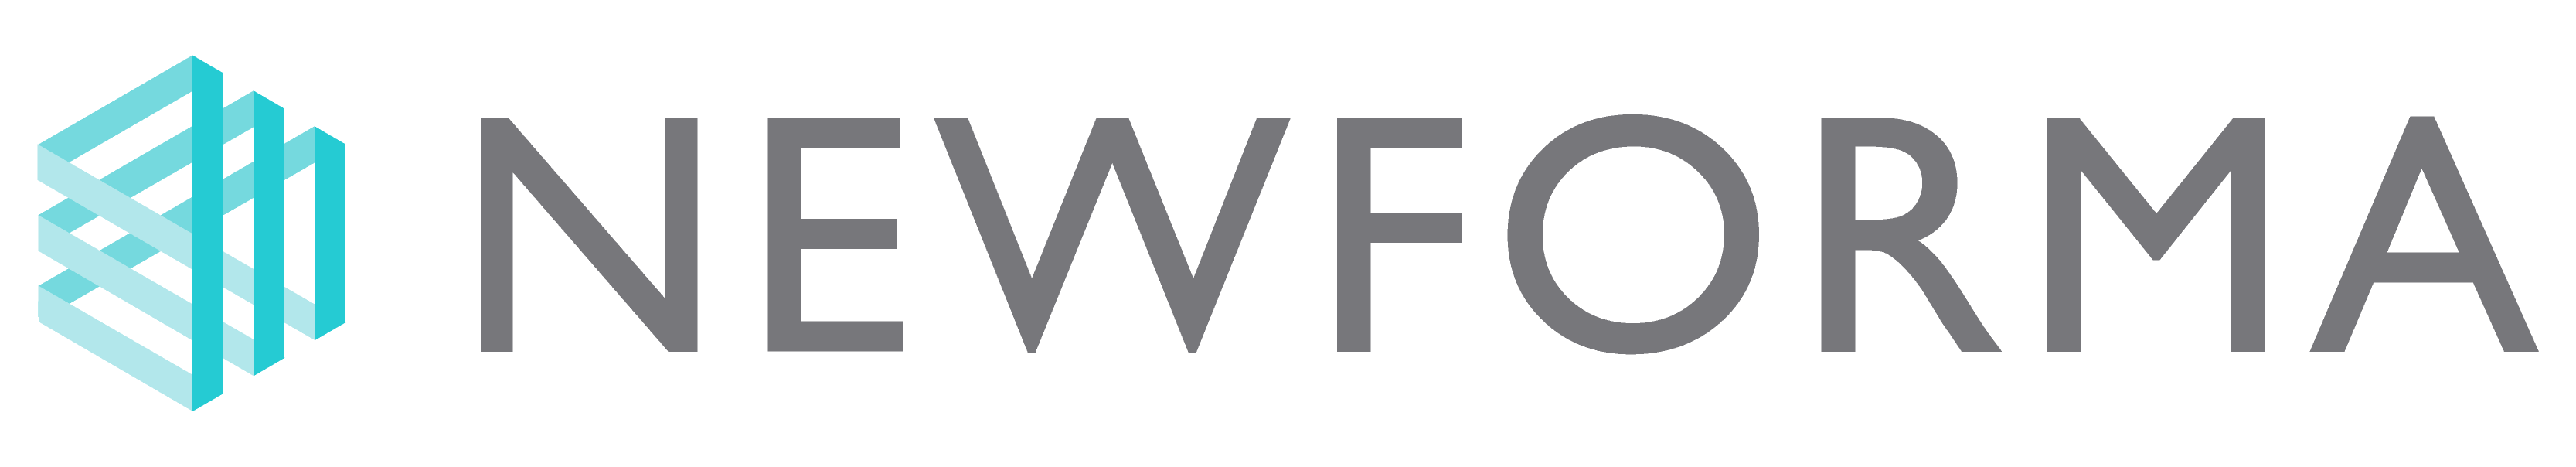 Newforma_2016 logo